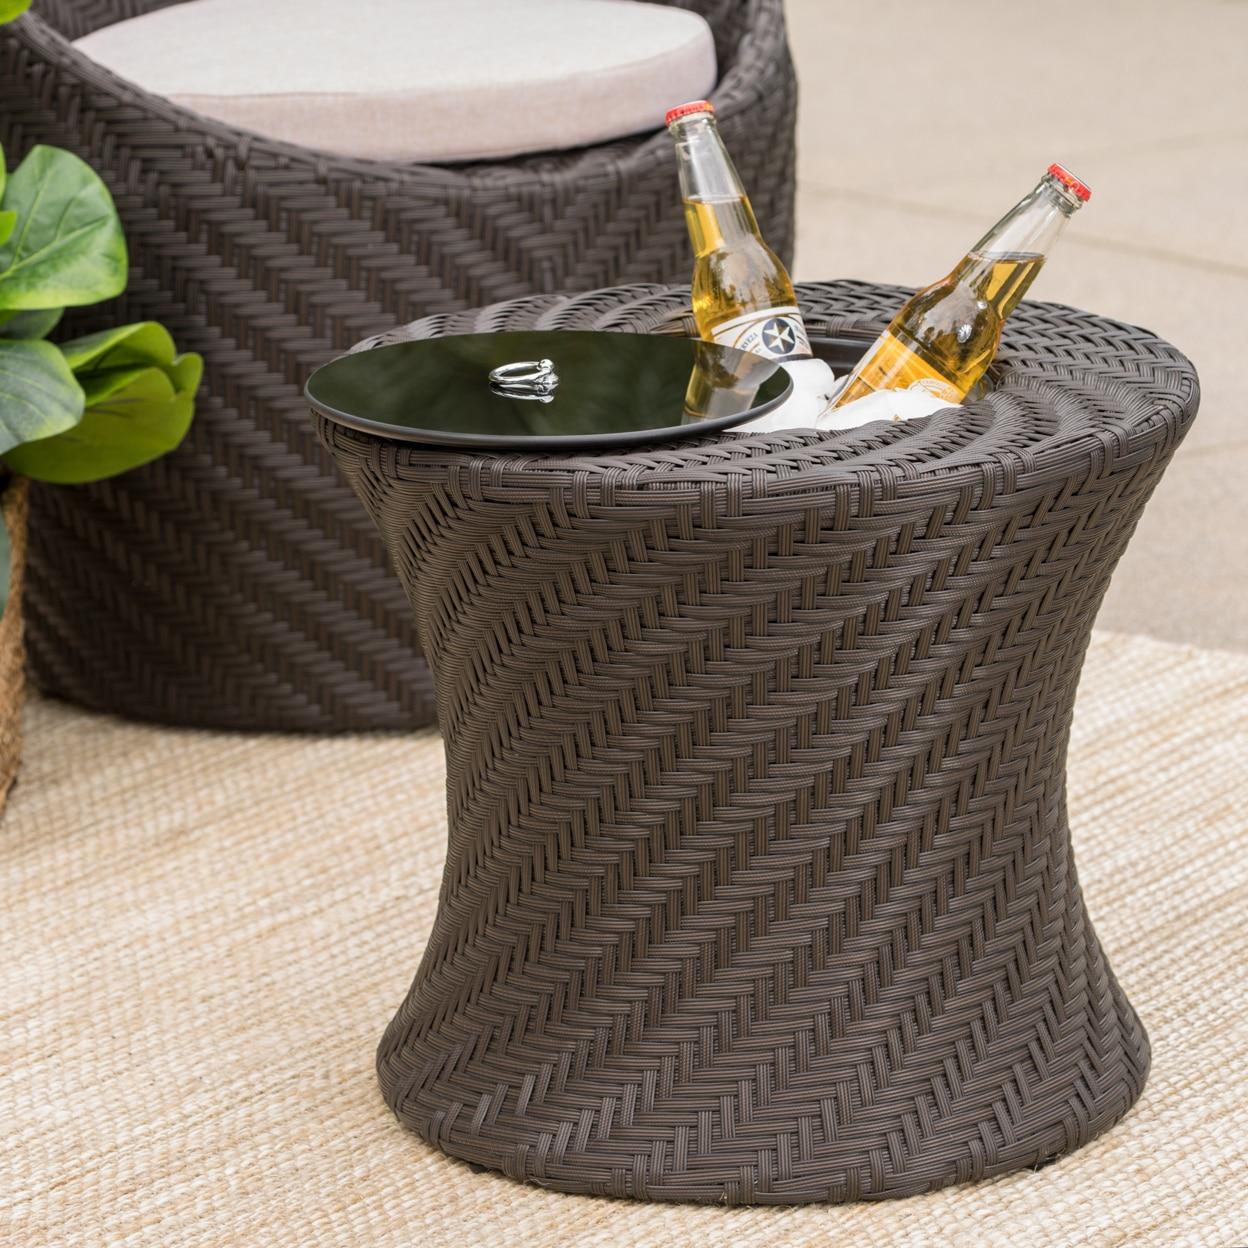 Белен Открытый коричневая плетеная акцент стол с ведро льда